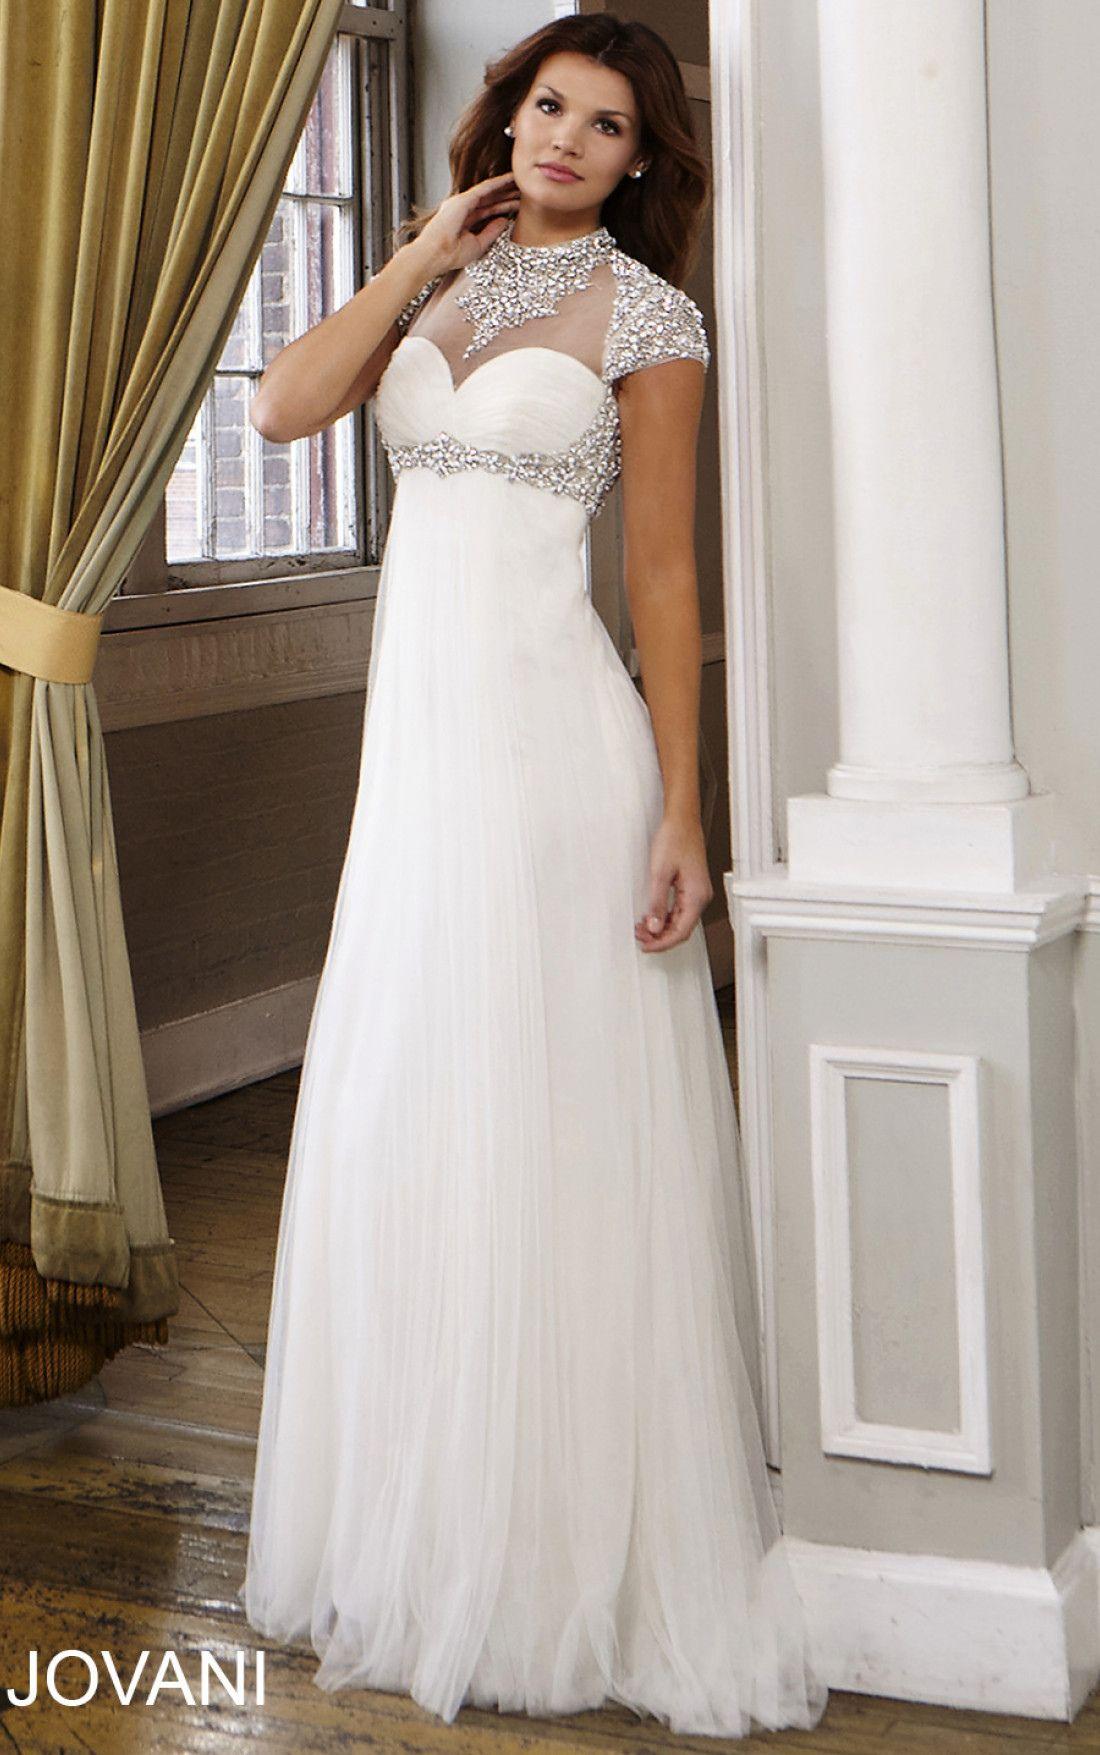 2018 Jovani Wedding Dresses - Wedding Dresses for the Mature Bride ...